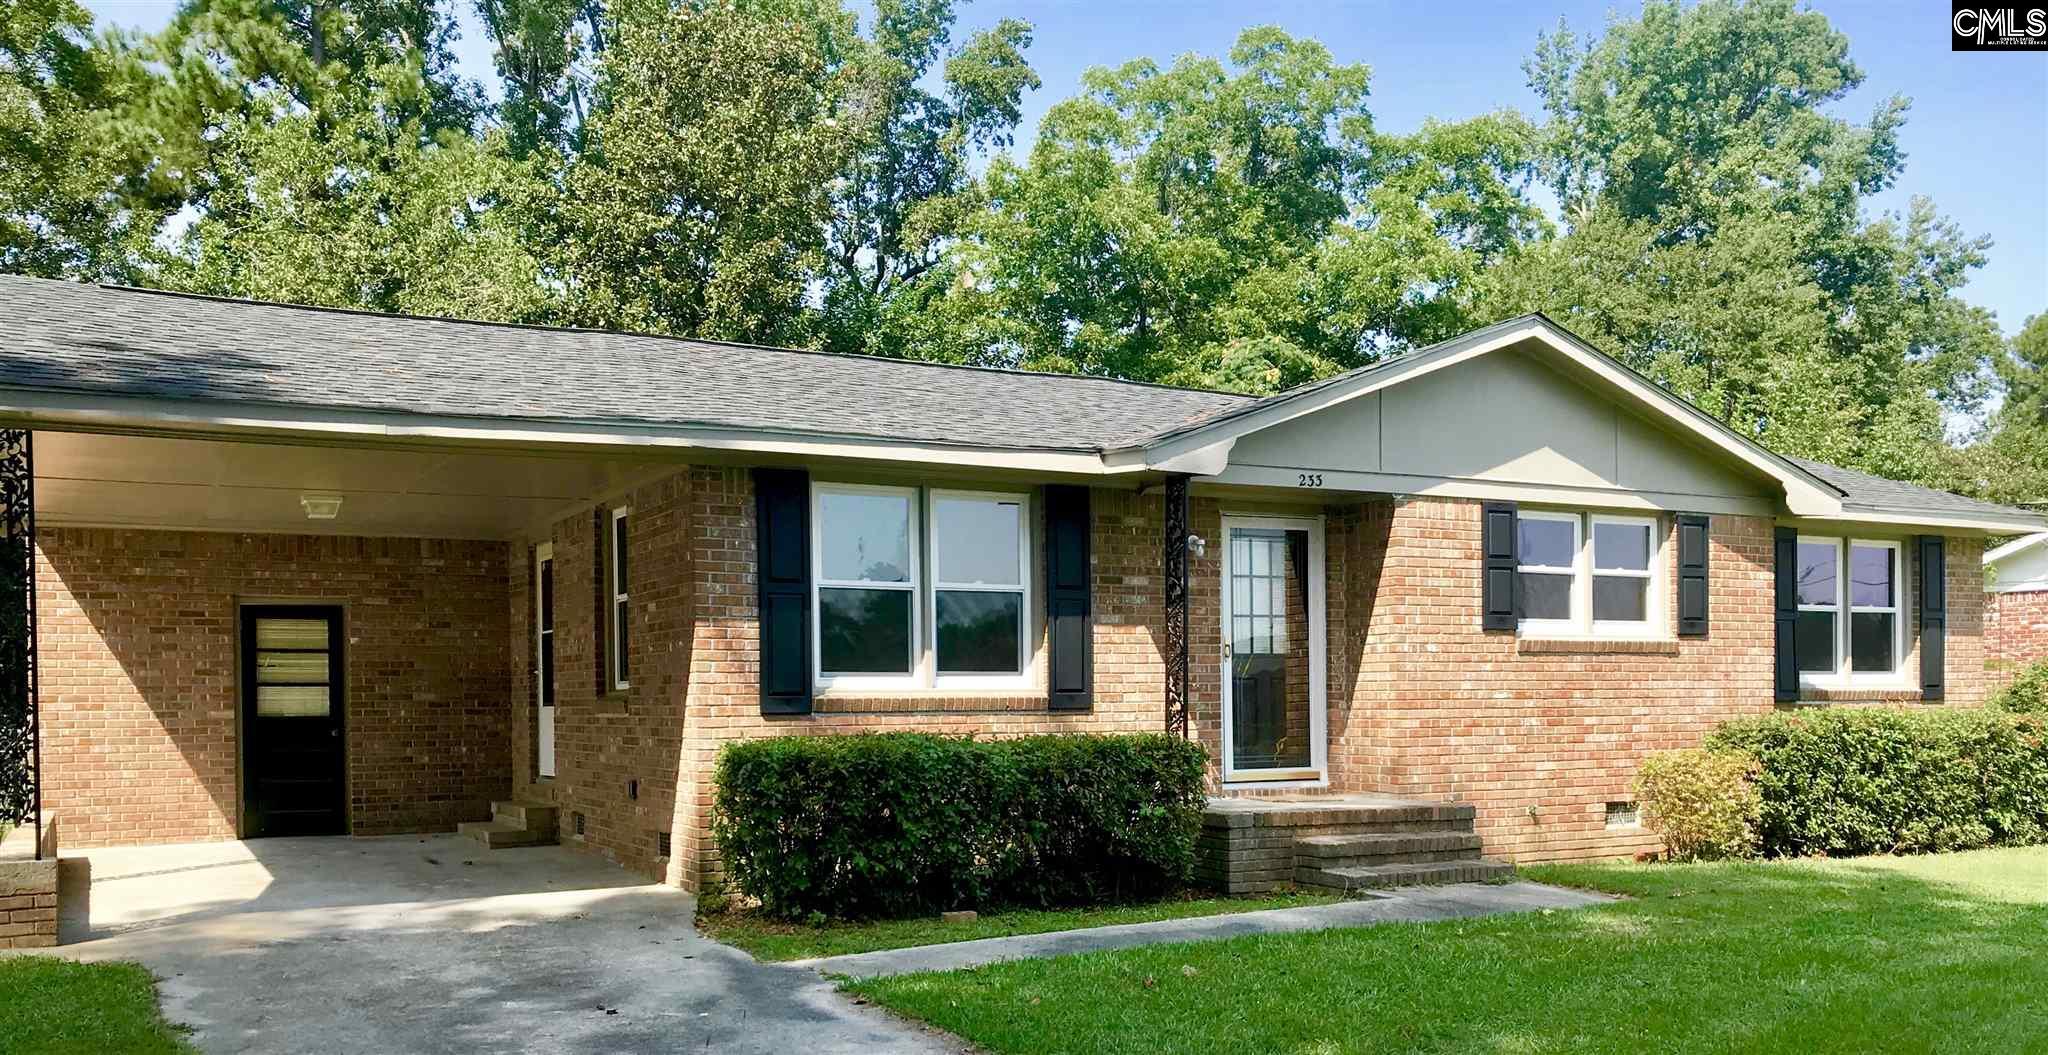 233 Brookdale Orangeburg, SC 29115